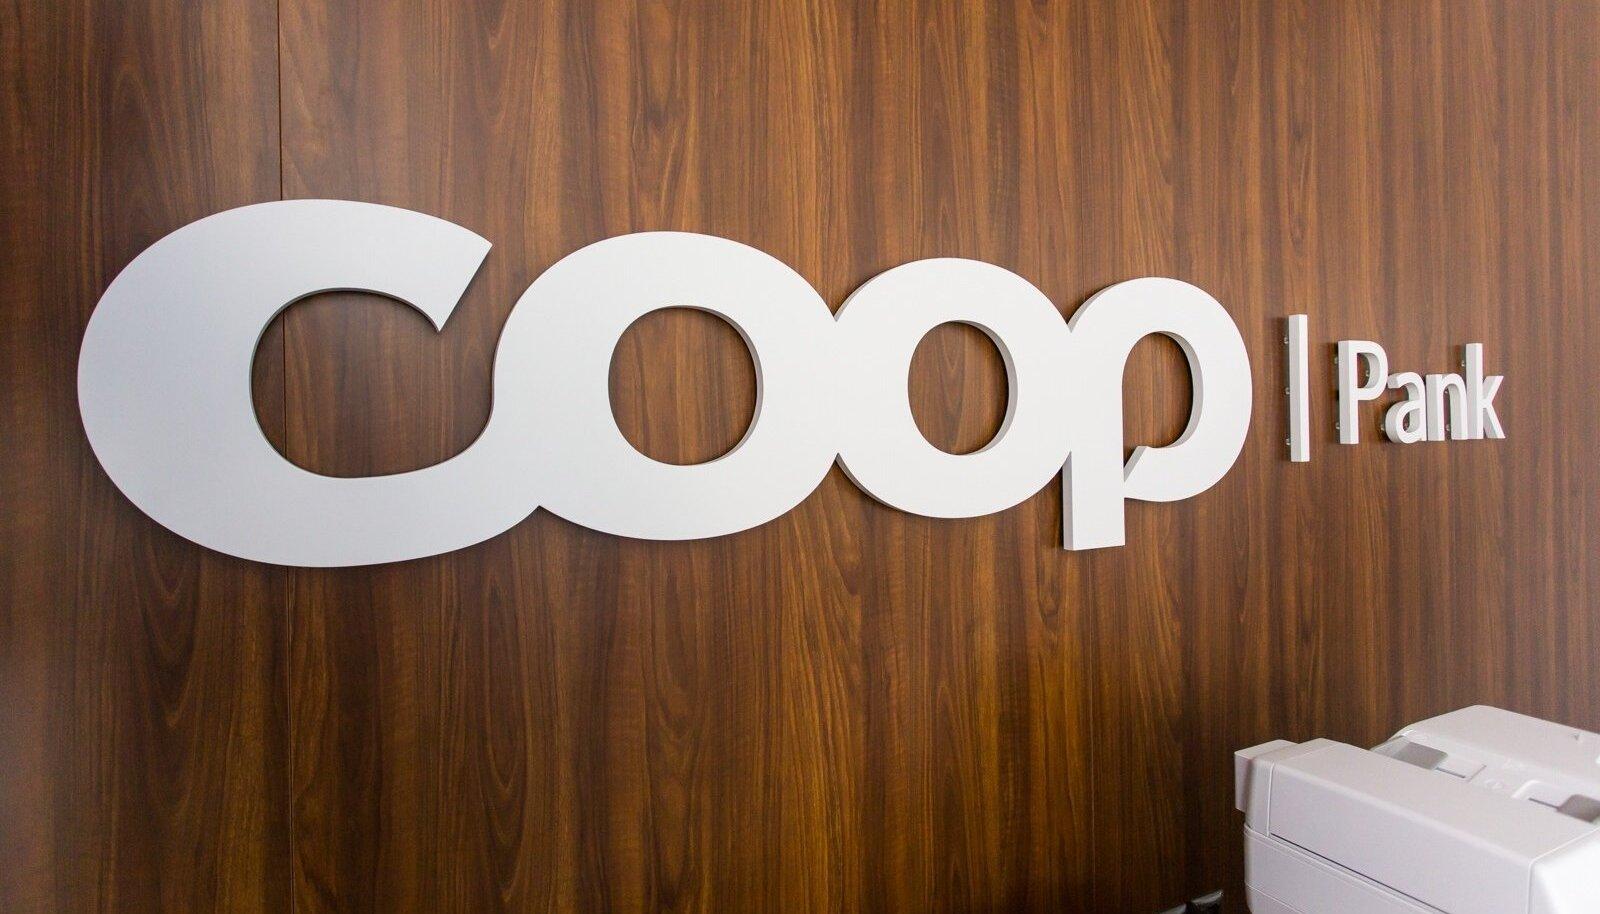 Coop panga Pärnu kontor